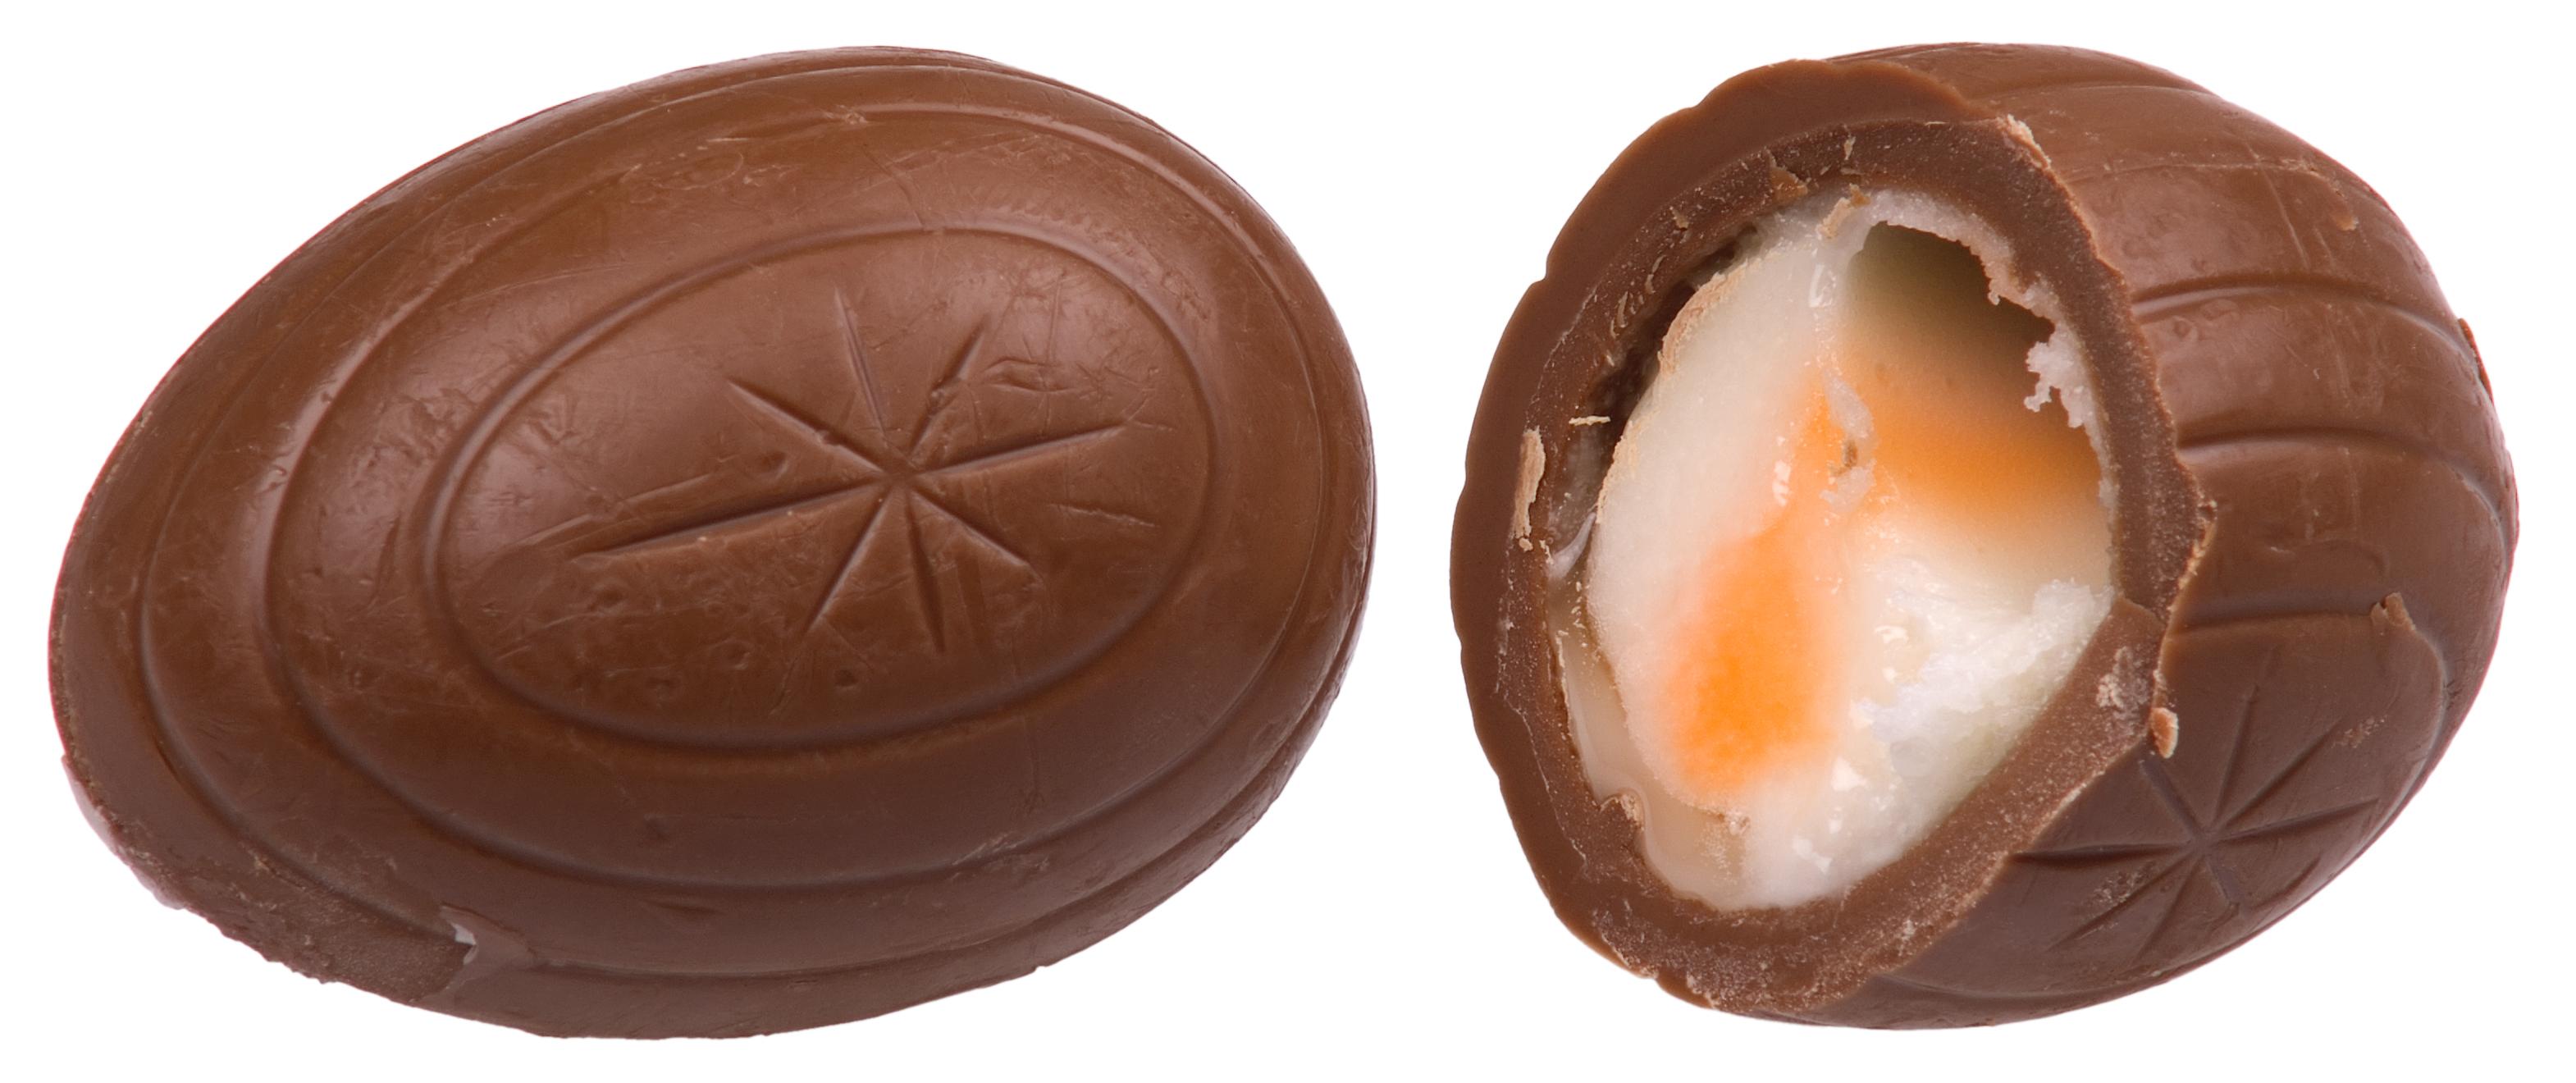 Cadbury Creme Egg.